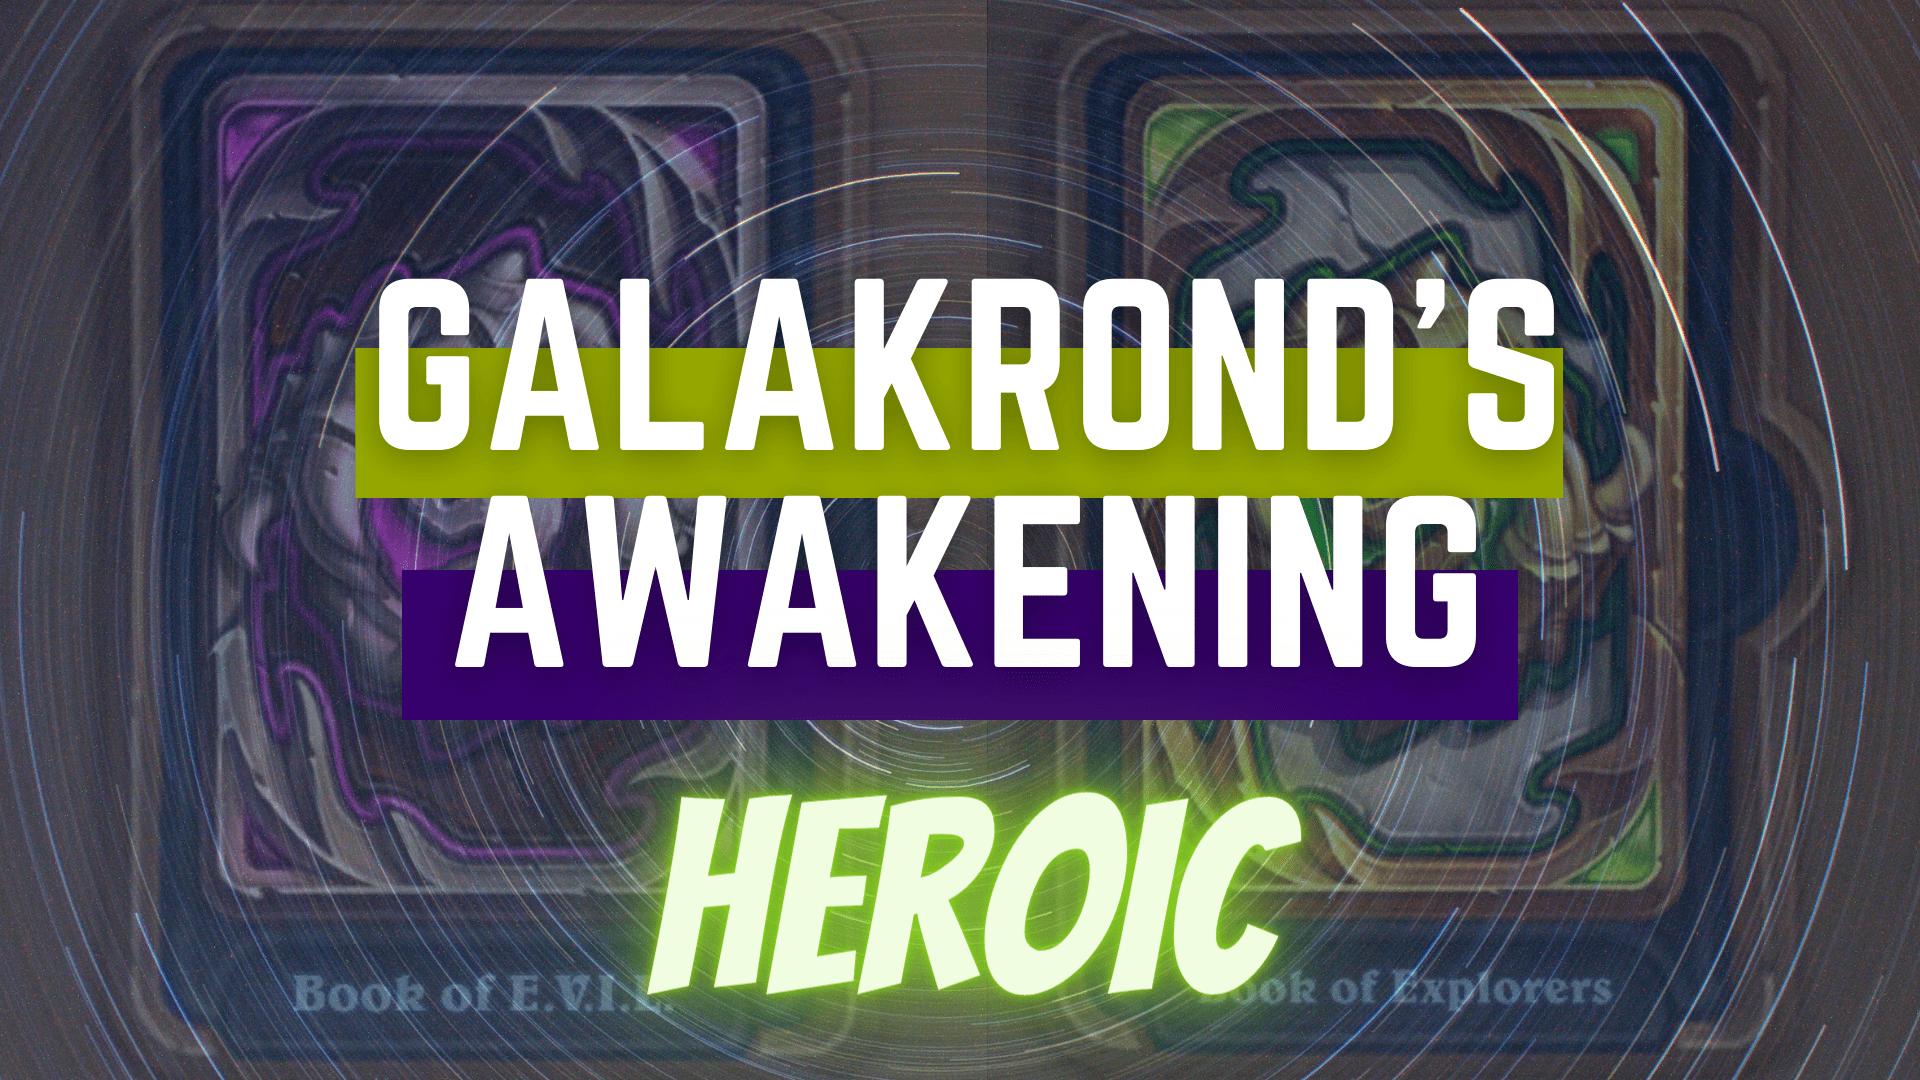 Galakrond's Awakening: Heroic GBD - e2p.com